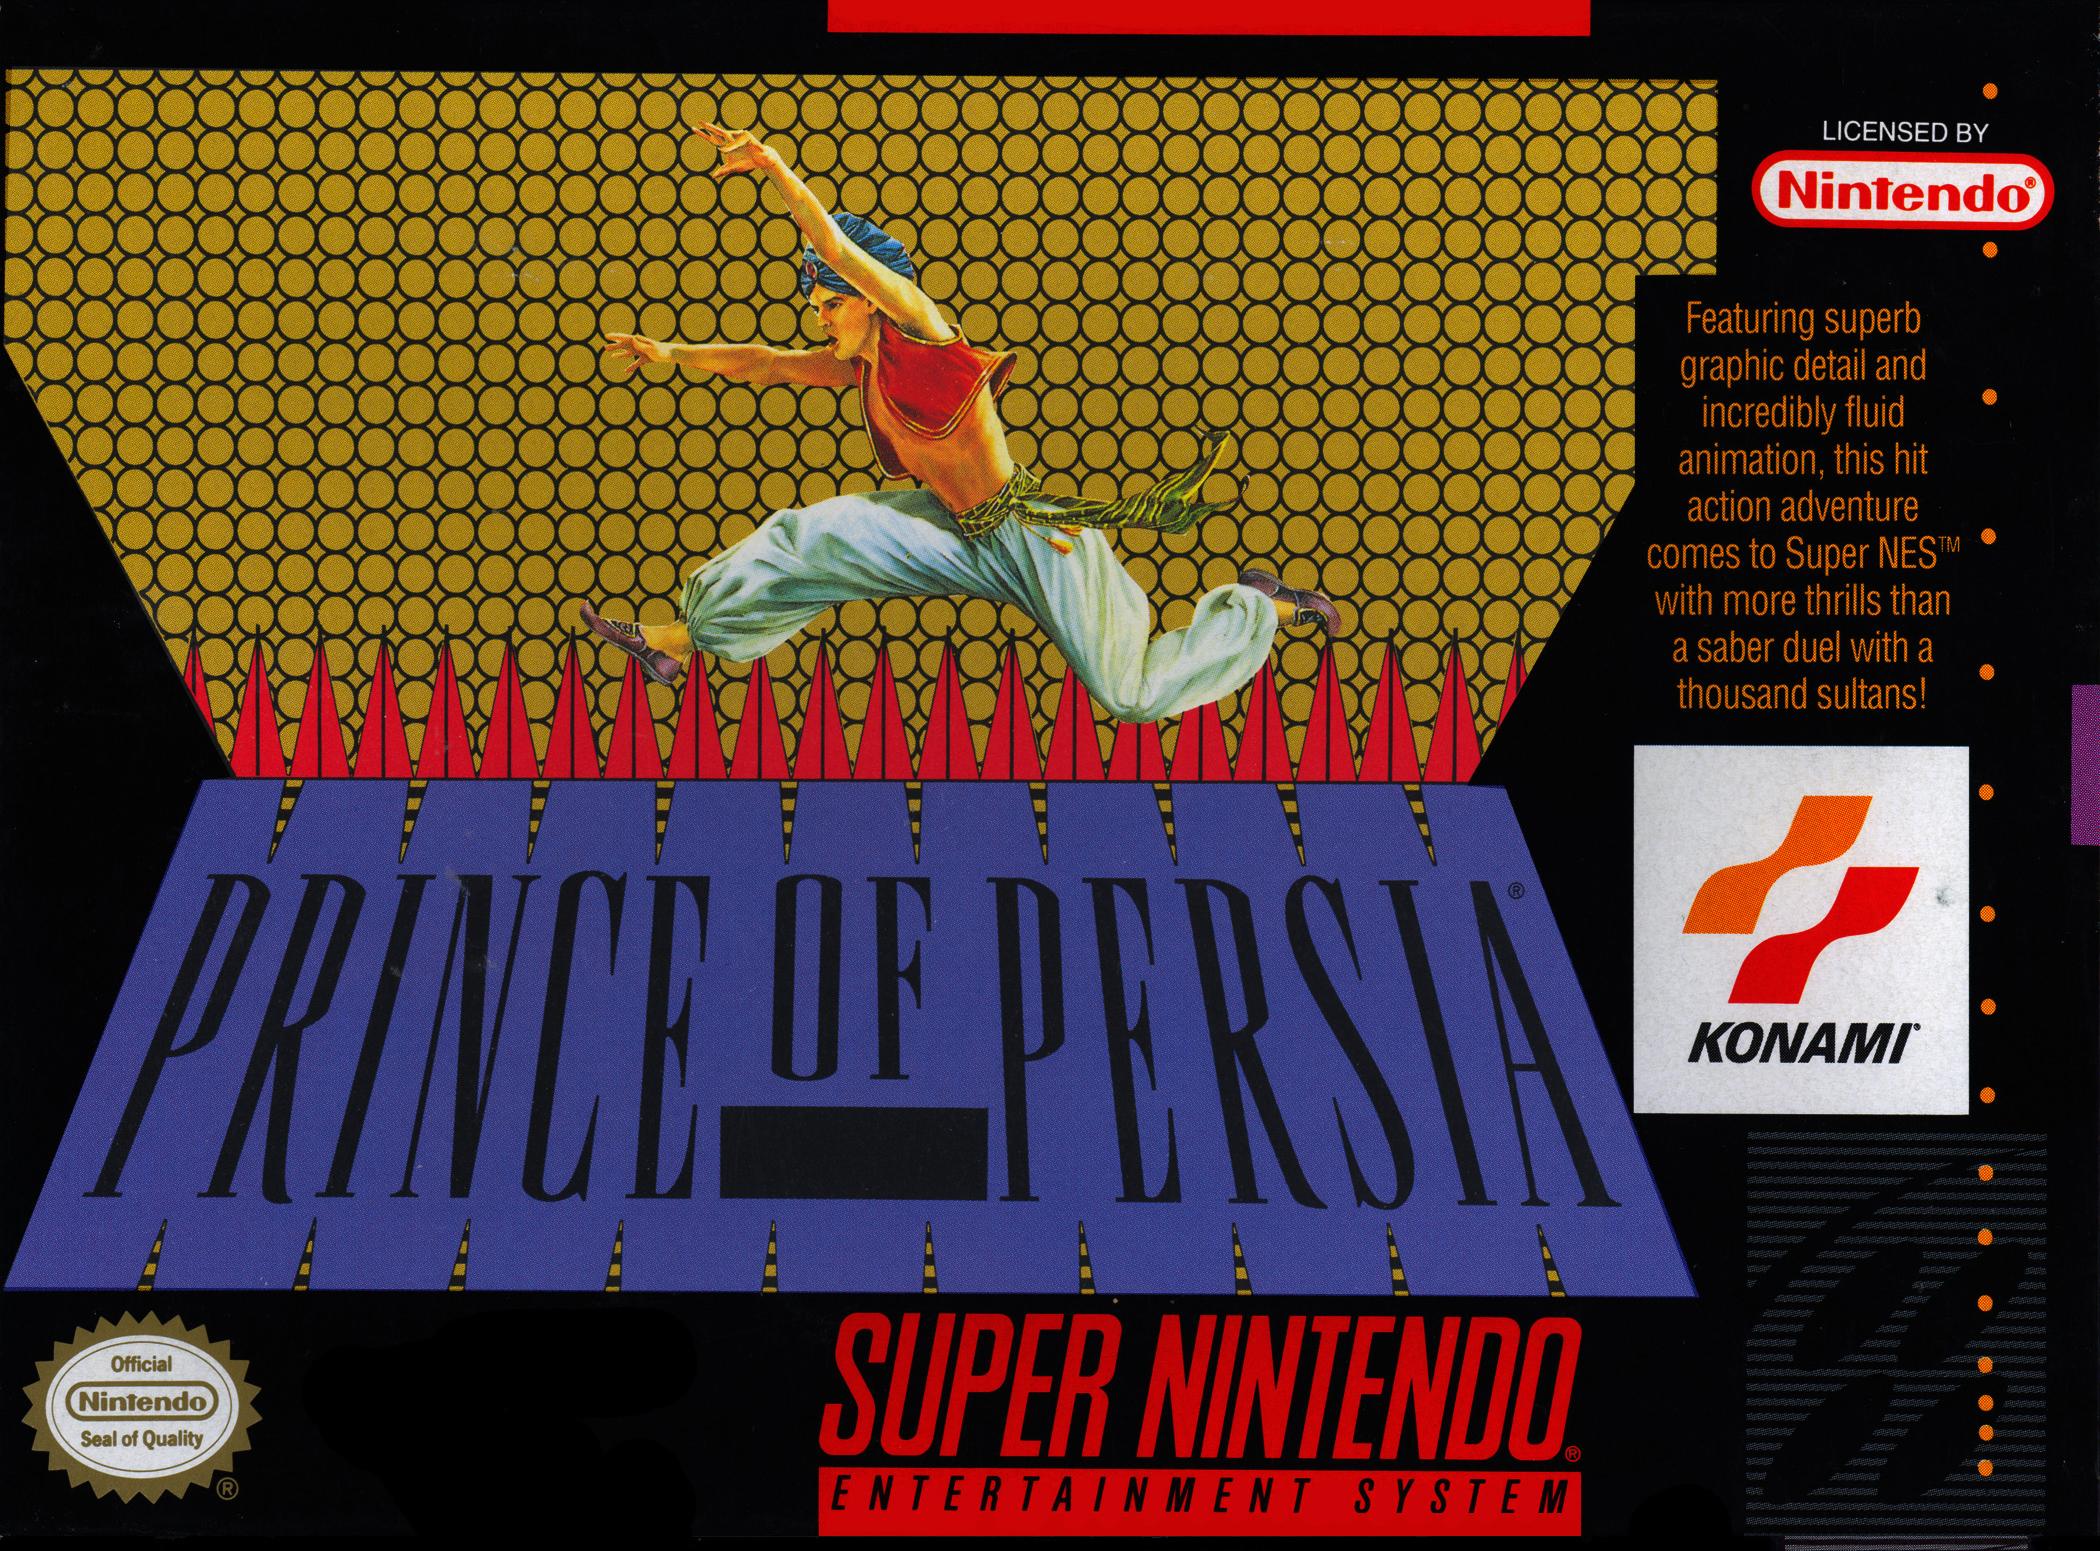 Prince of Persia/SNES